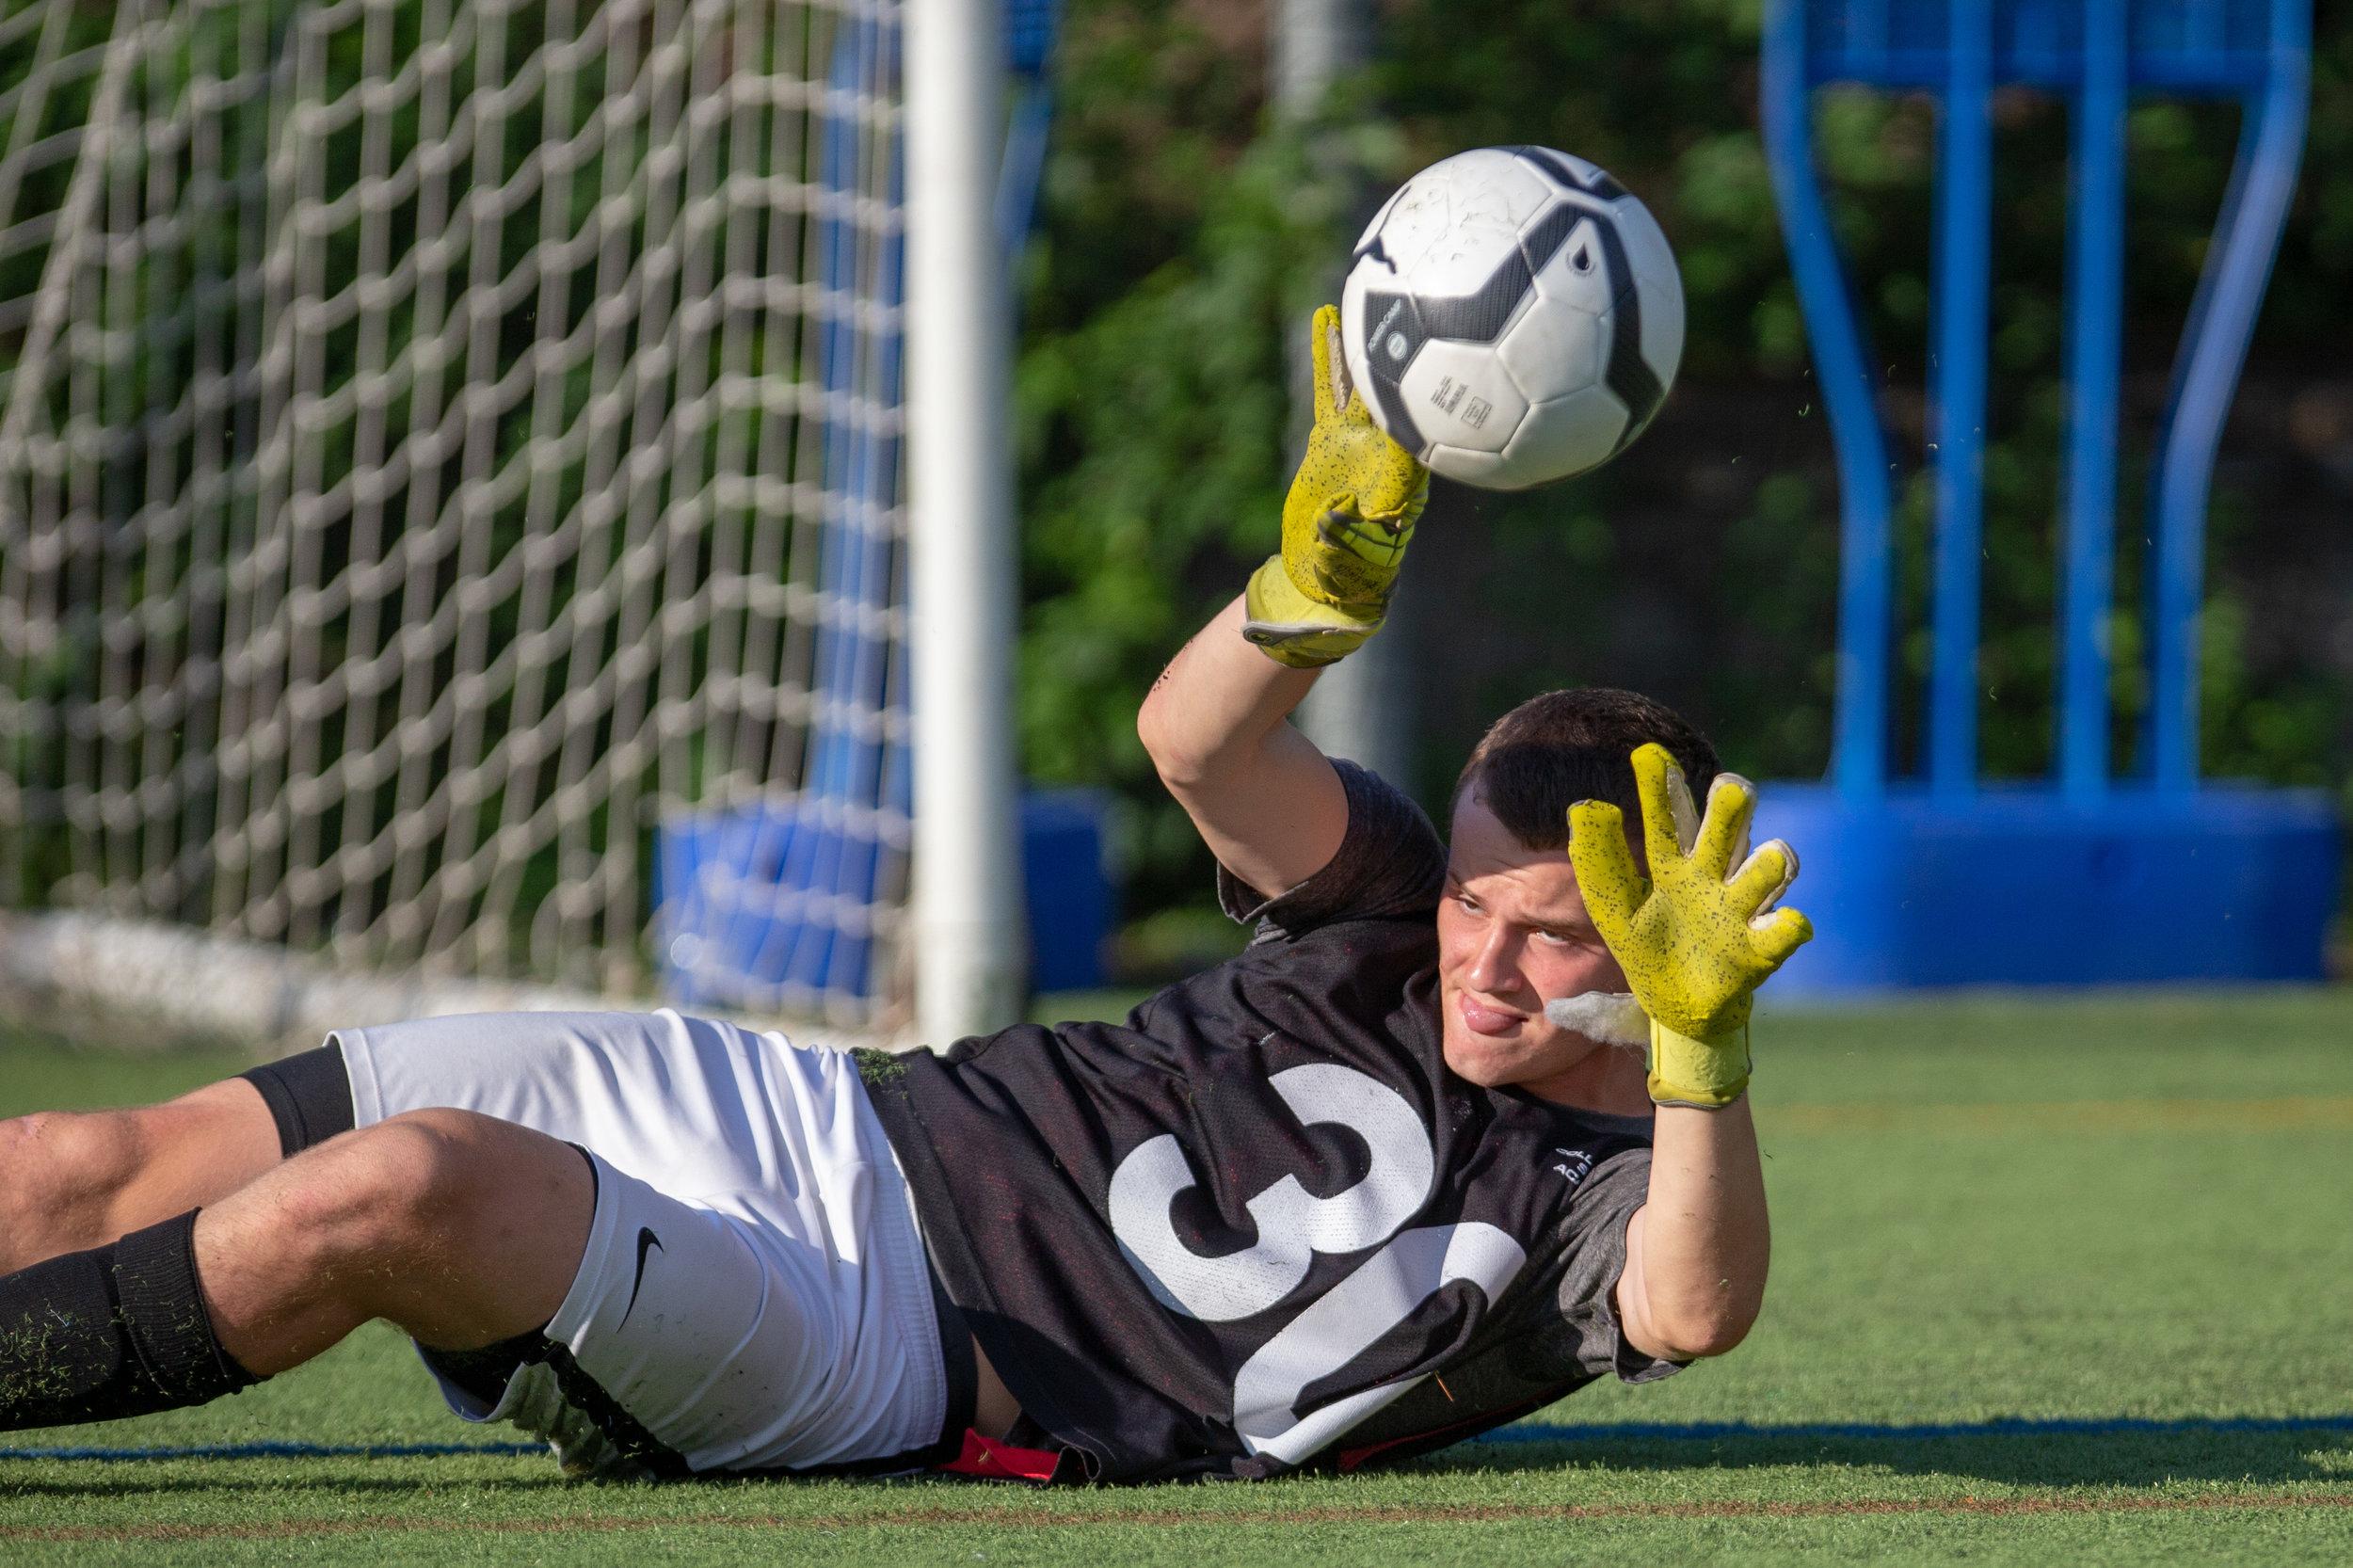 Collegiate soccer goalkeeper save training july